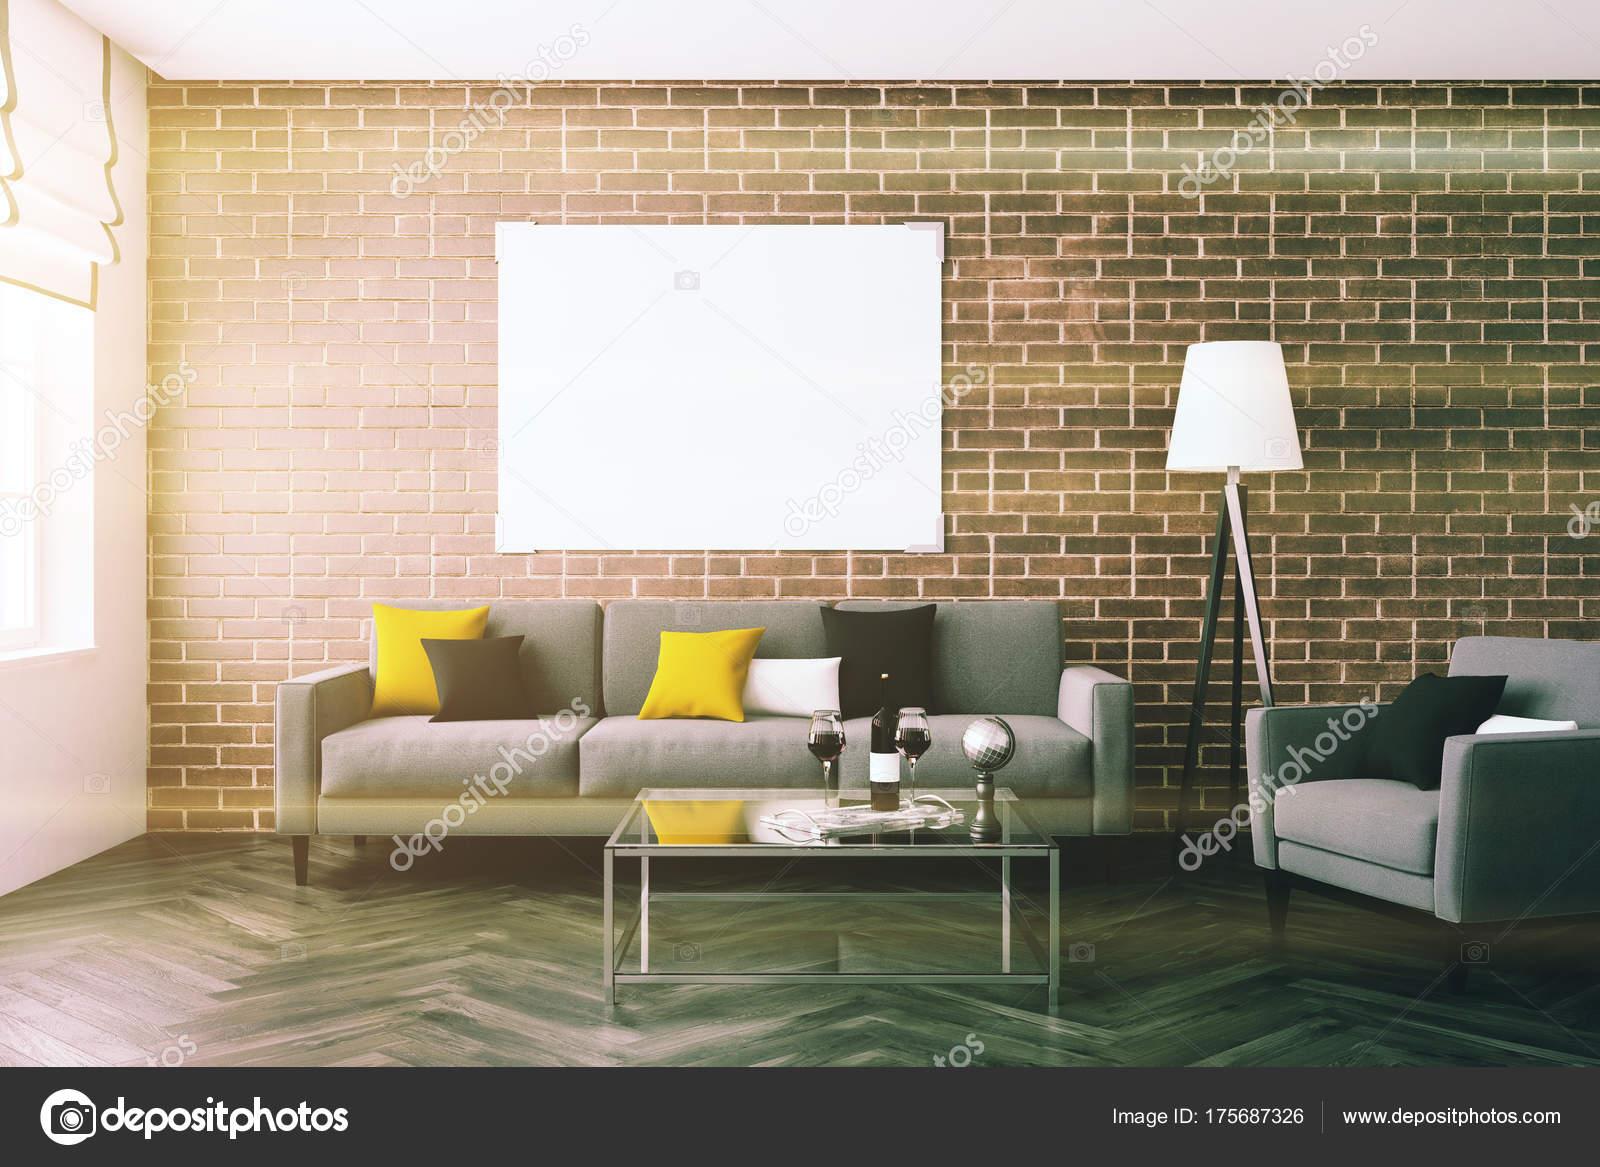 Bakstenen muur woonkamer, sofa, poster toned — Stockfoto ...